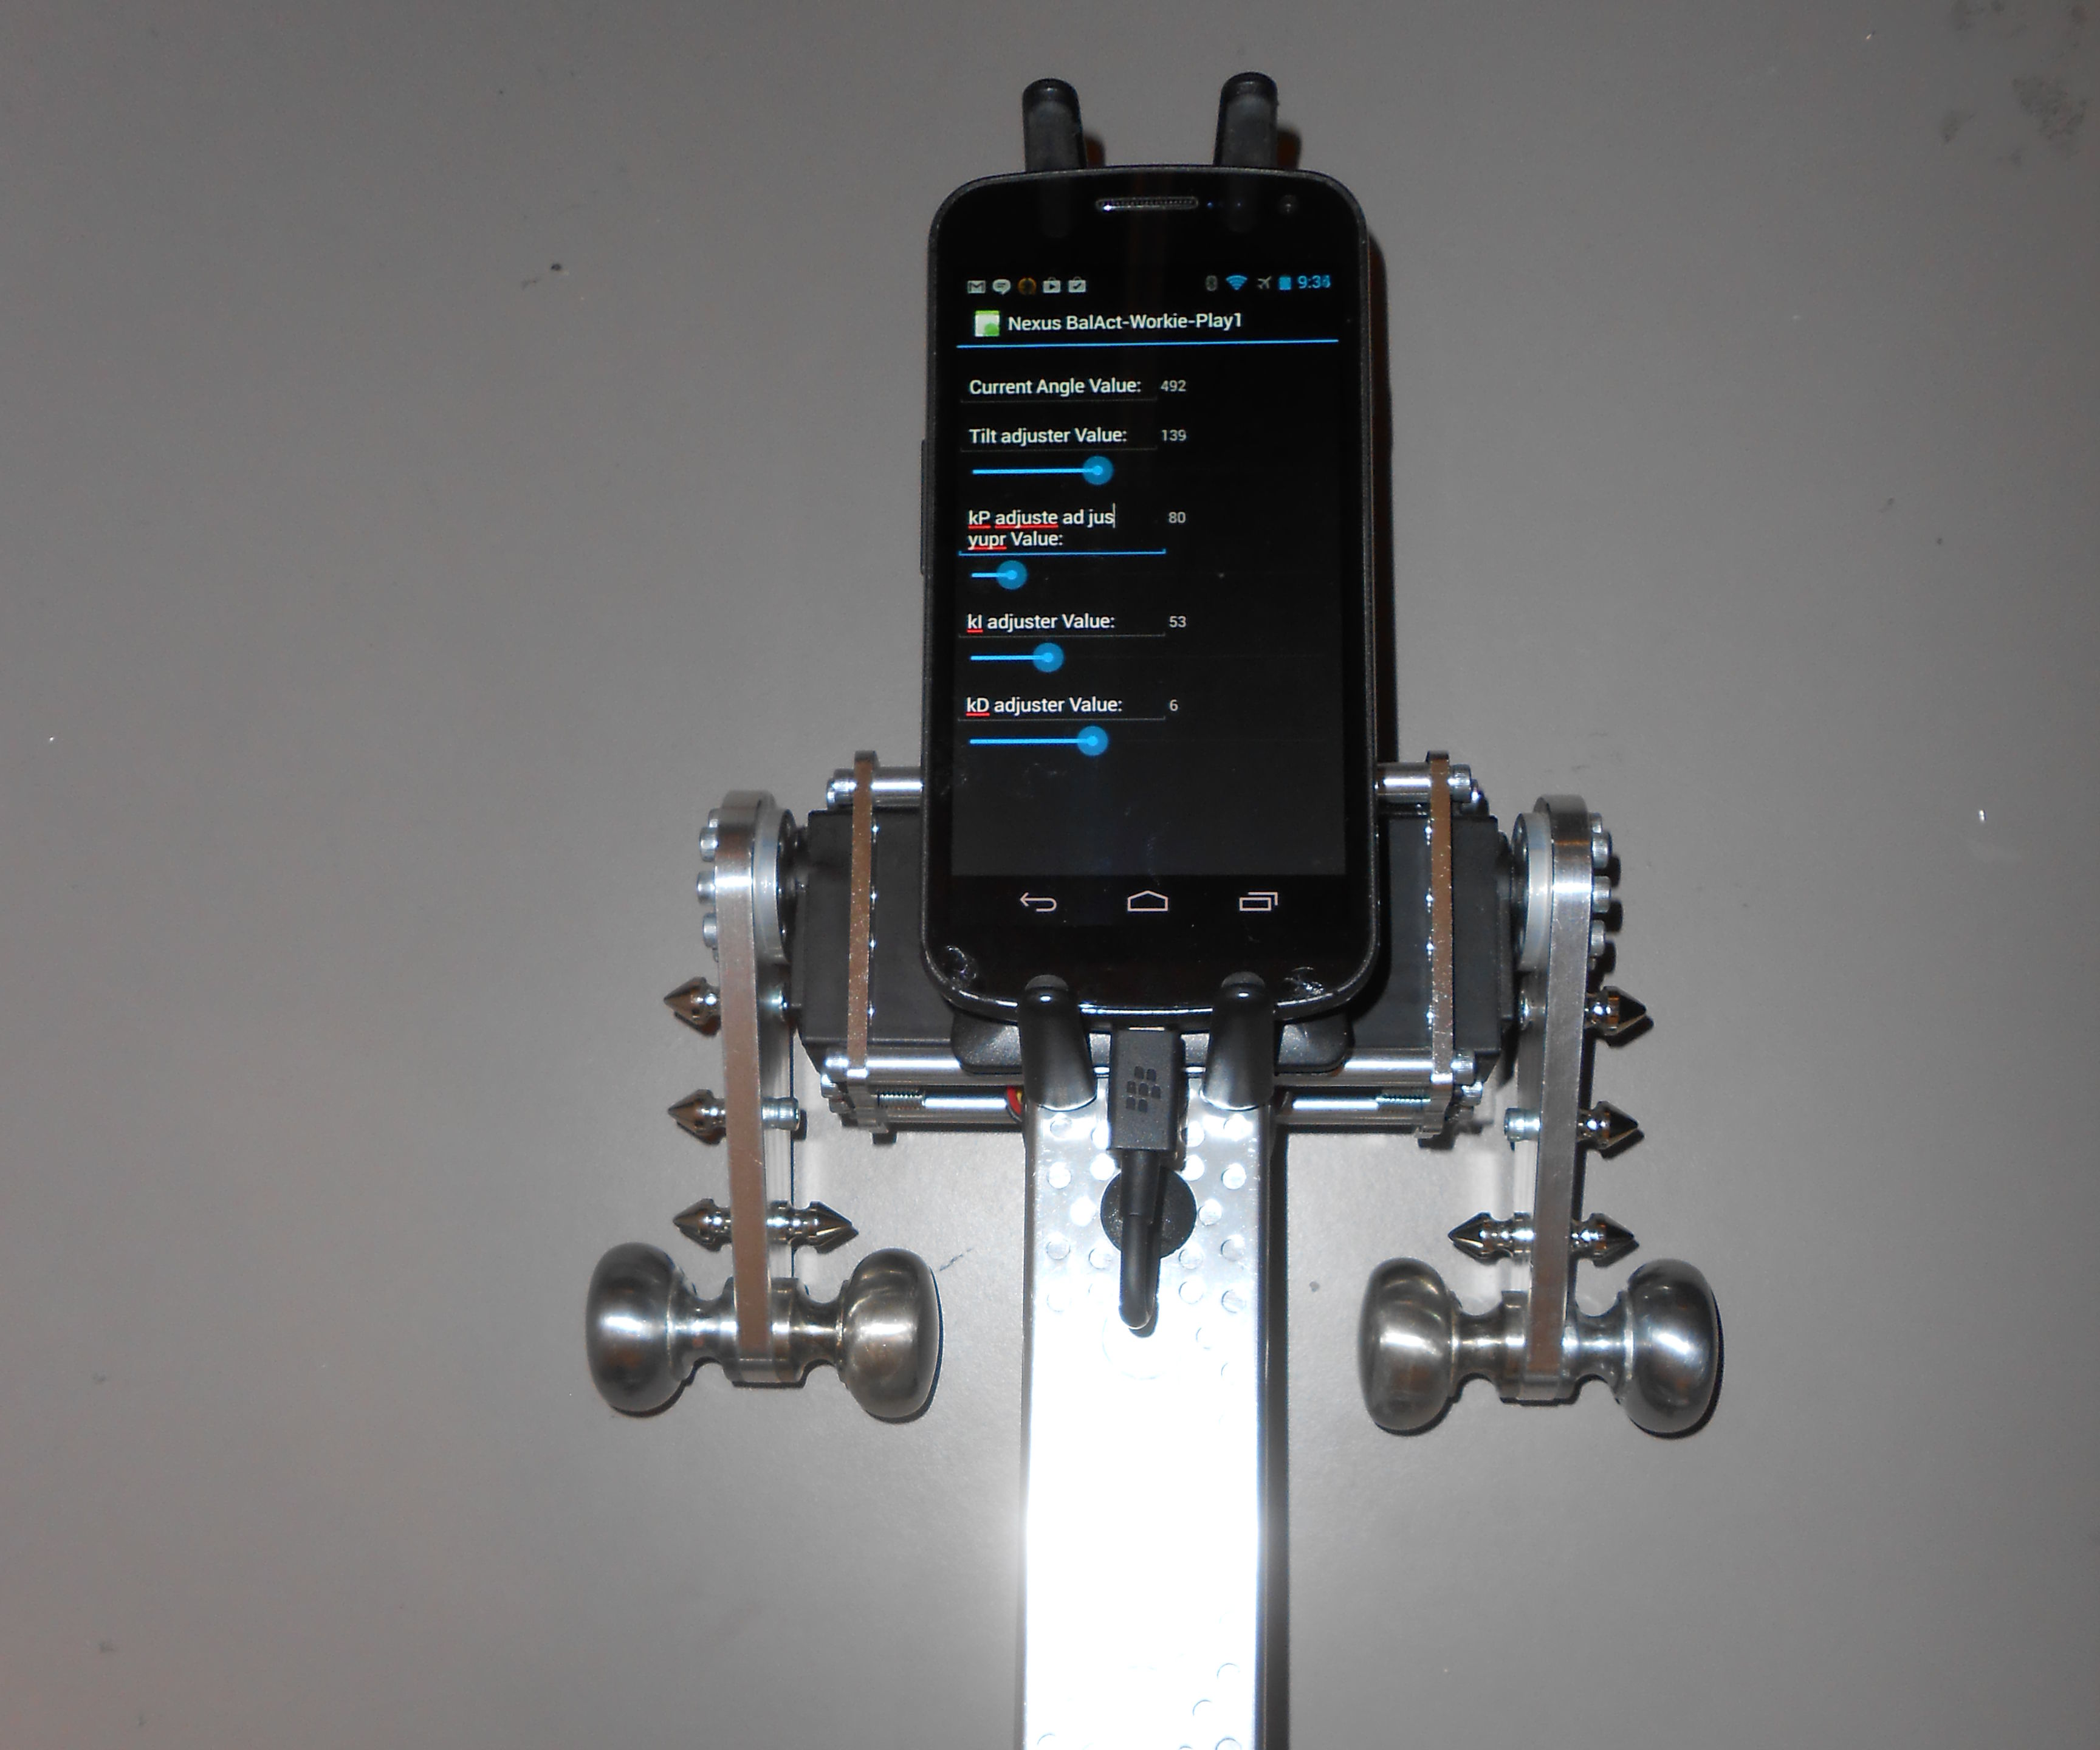 Baldroid v3 Balancing Robot with Actobotics parts and IOIO-OTG